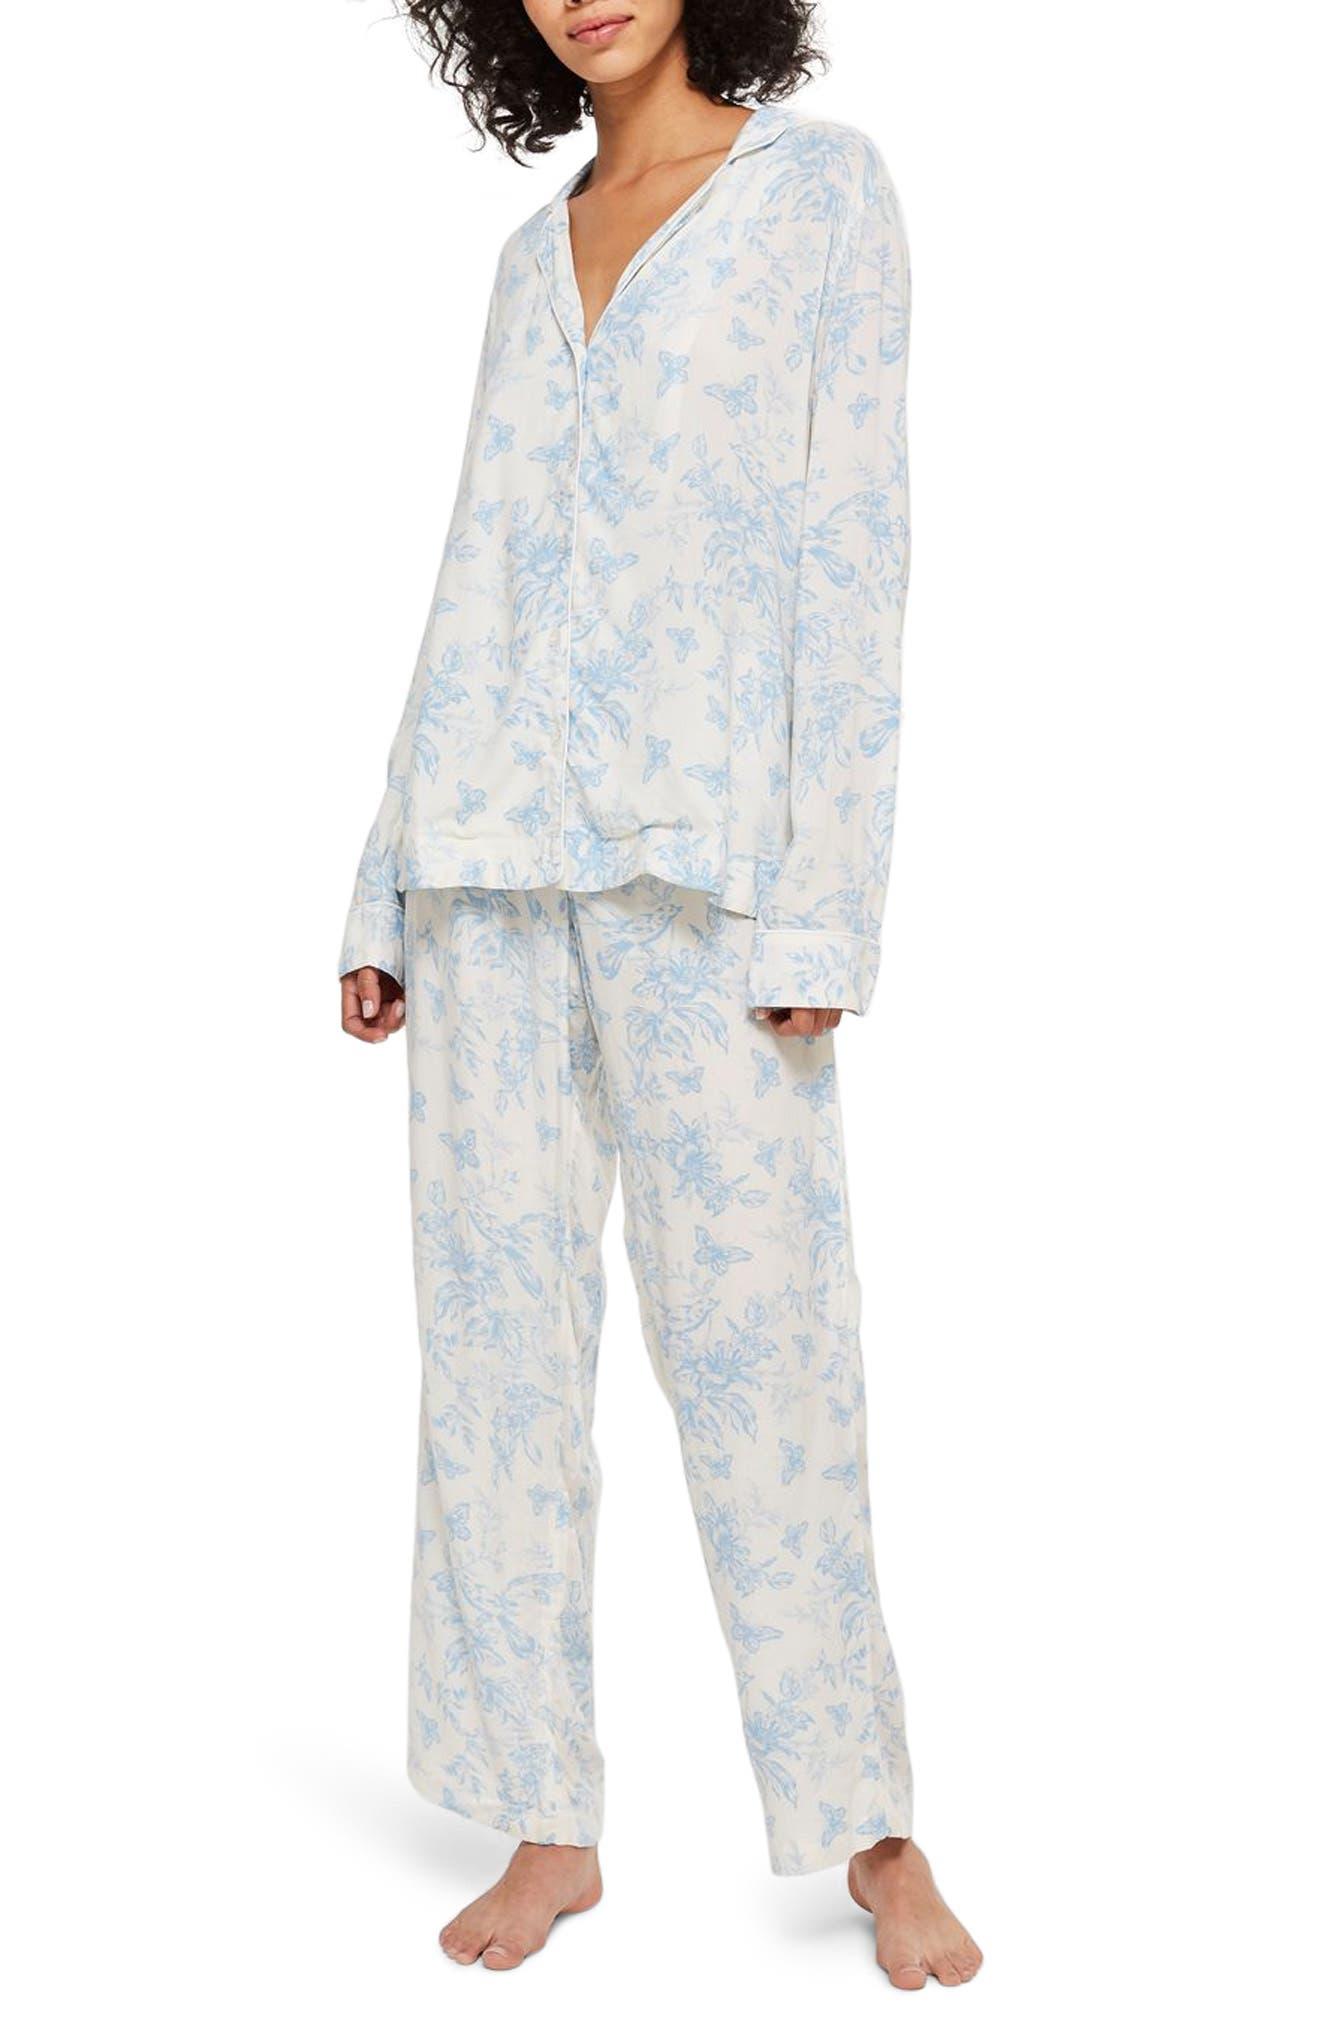 Topshop French Bird Pajamas